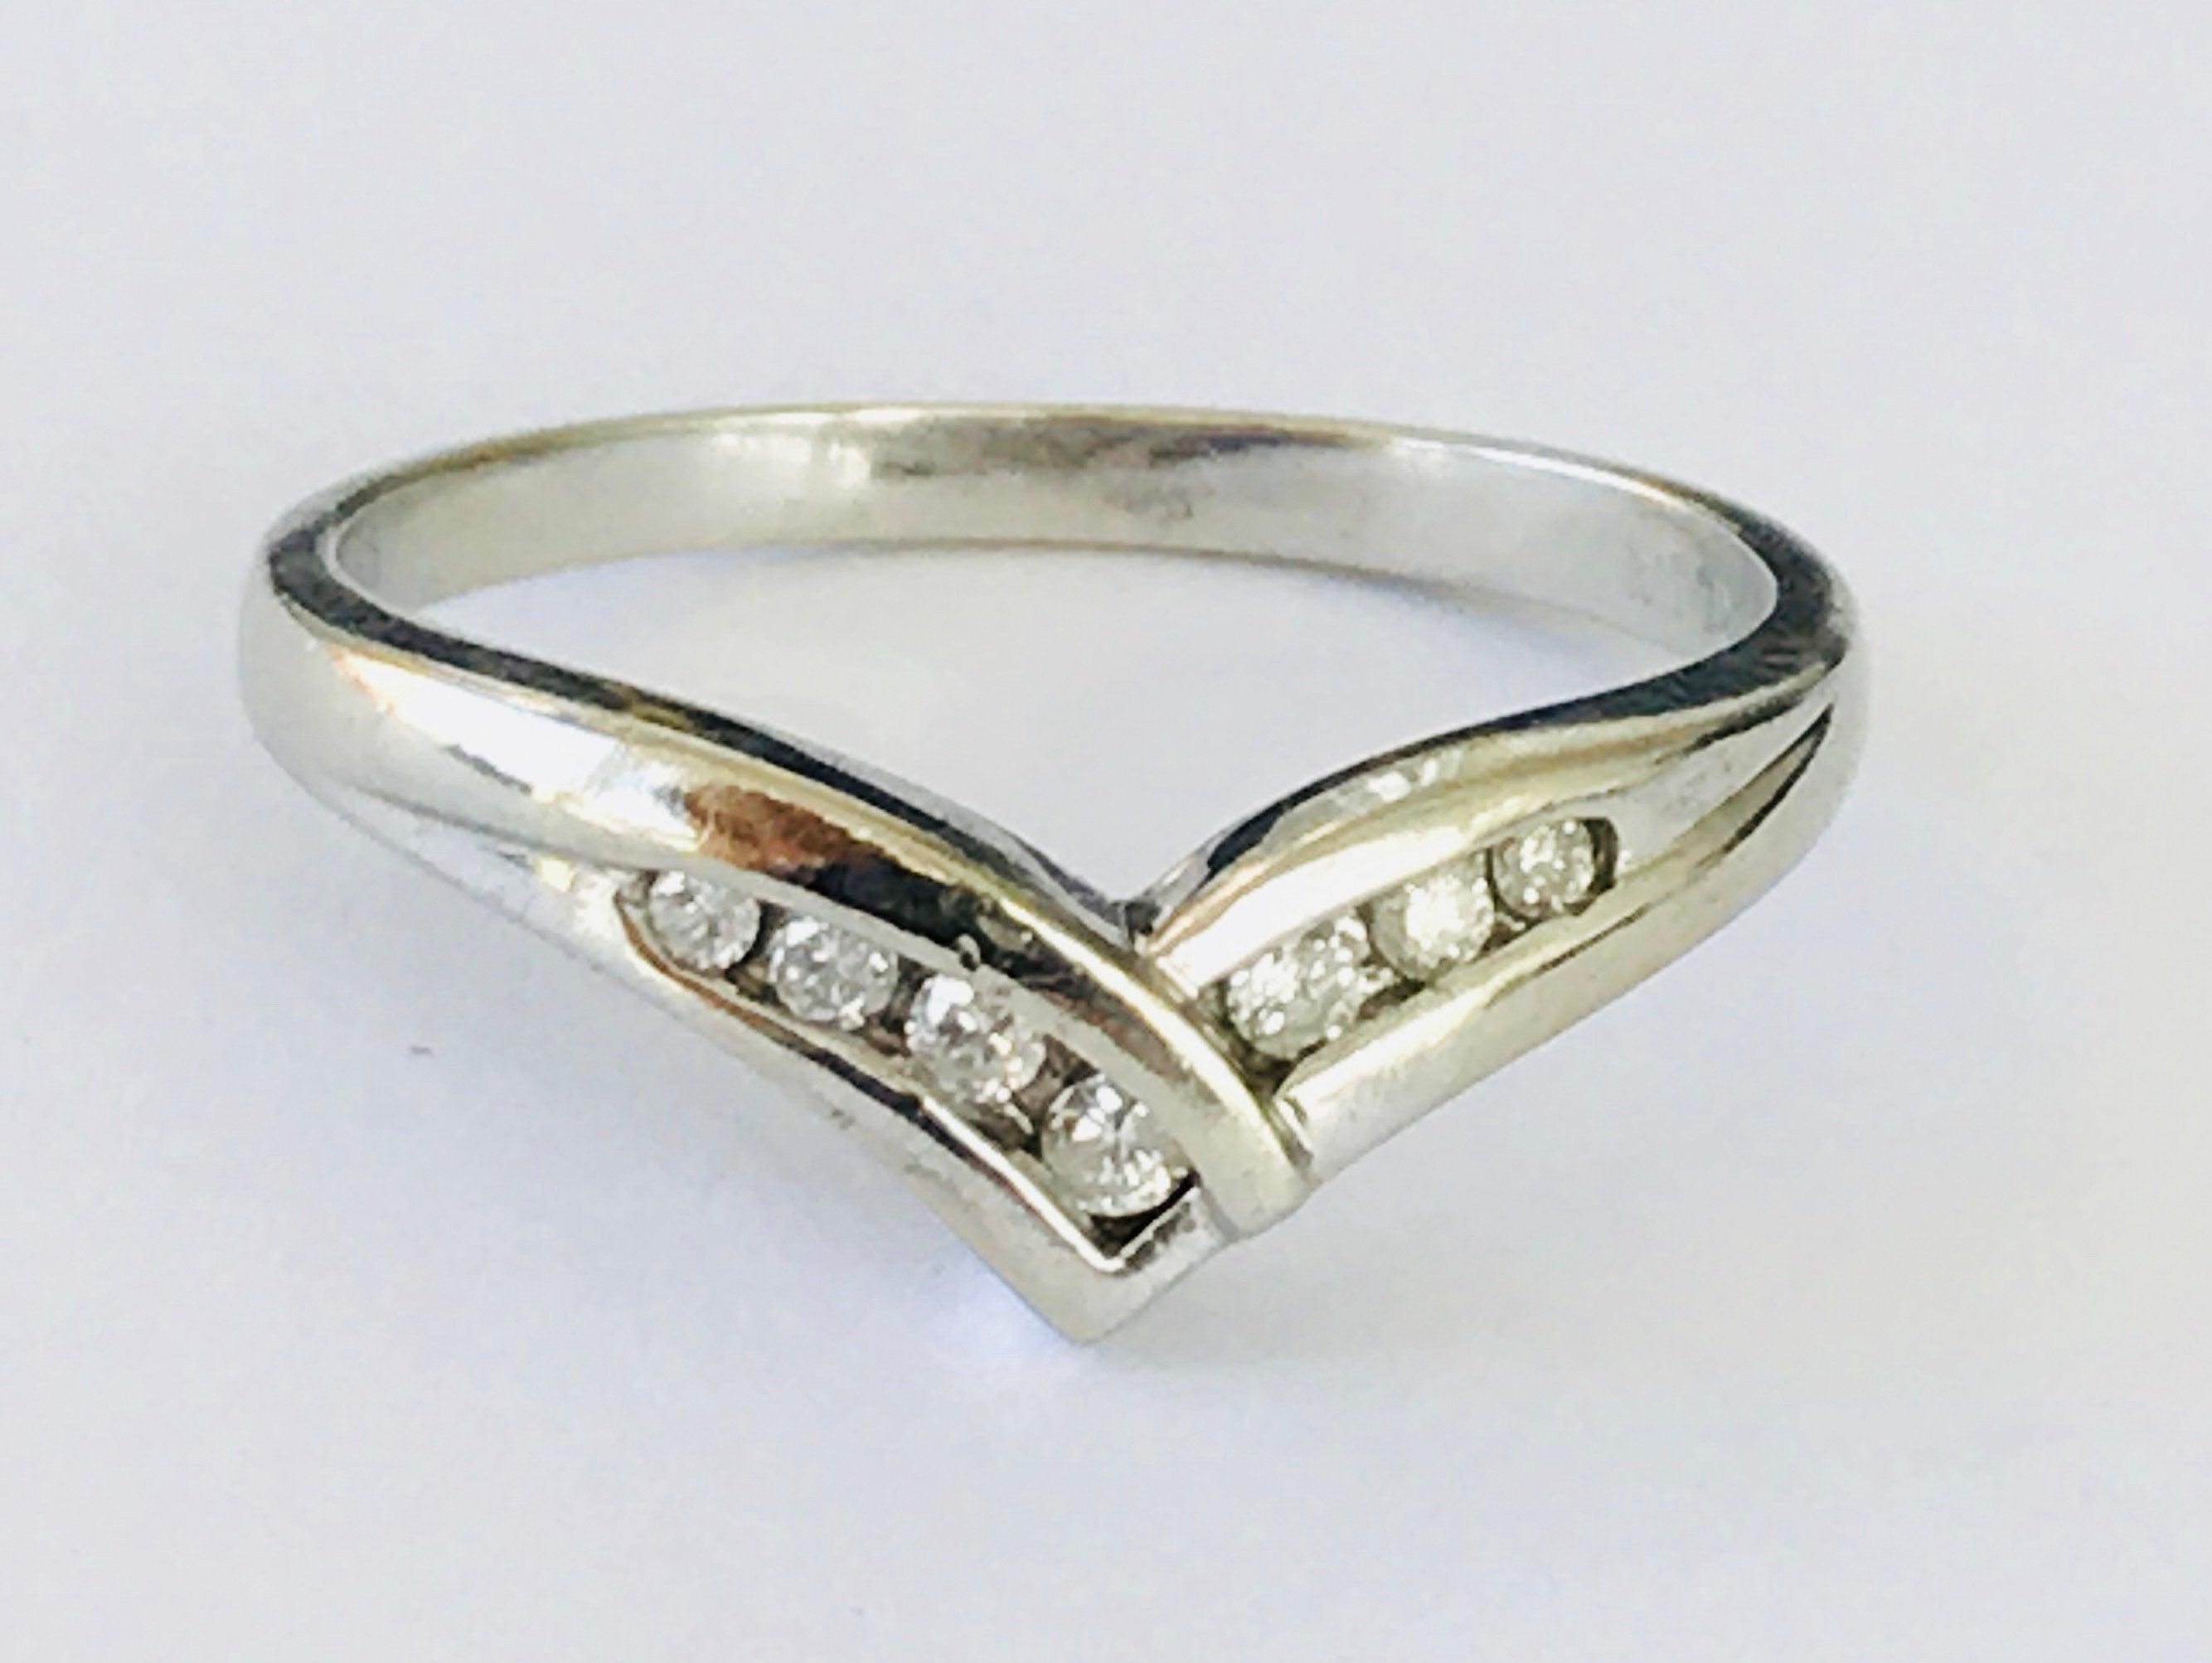 Super Sparkling Vintage 9ct White Gold Diamond Wishbone Ring – Fully Hallmarked Regarding 2017 Sparkling Wishbone Rings (View 11 of 25)